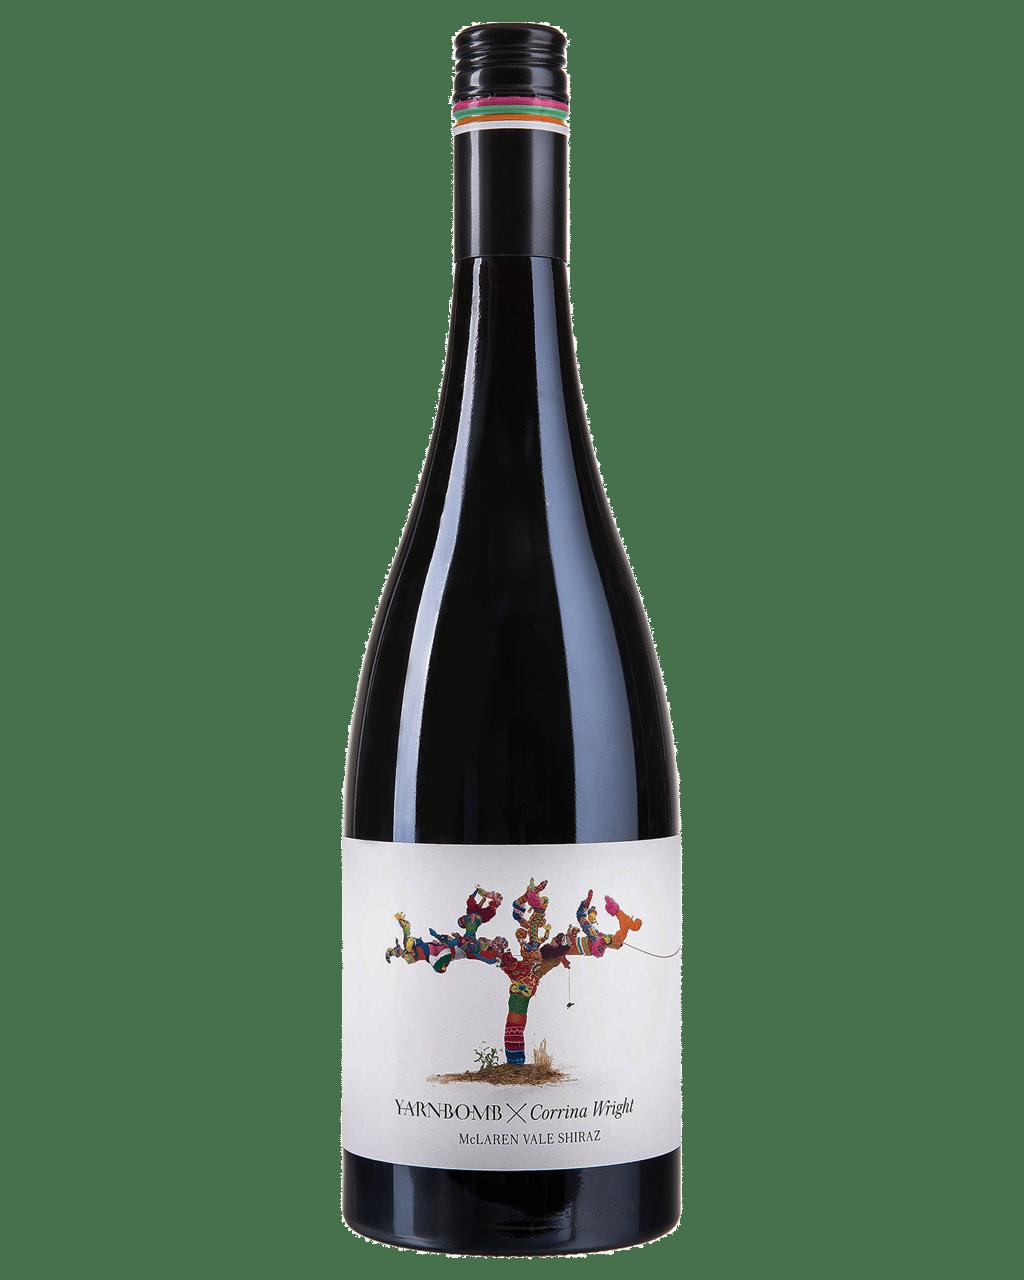 yarnbomb mclaren vale shiraz | dan murphy's | buy wine, champagne